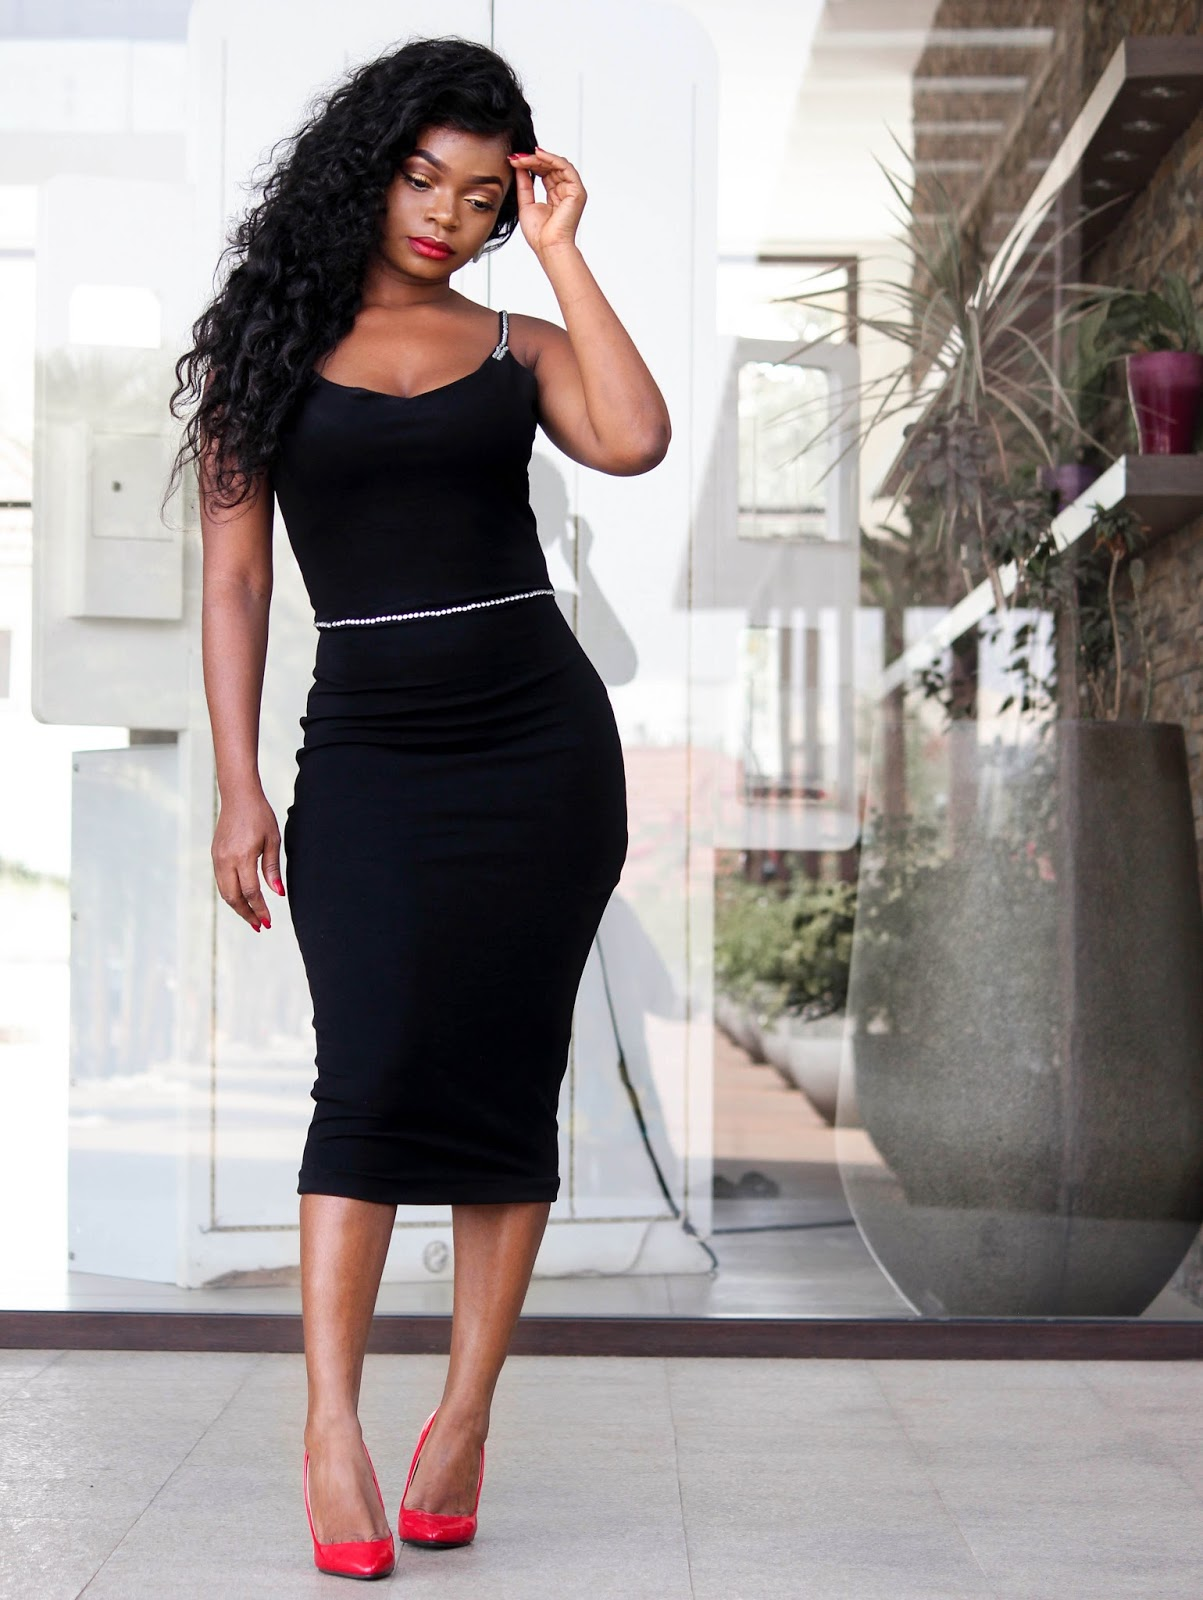 BLACK BODYCON DRESS - Black Sleeveless Bodycon Dress from Porshher